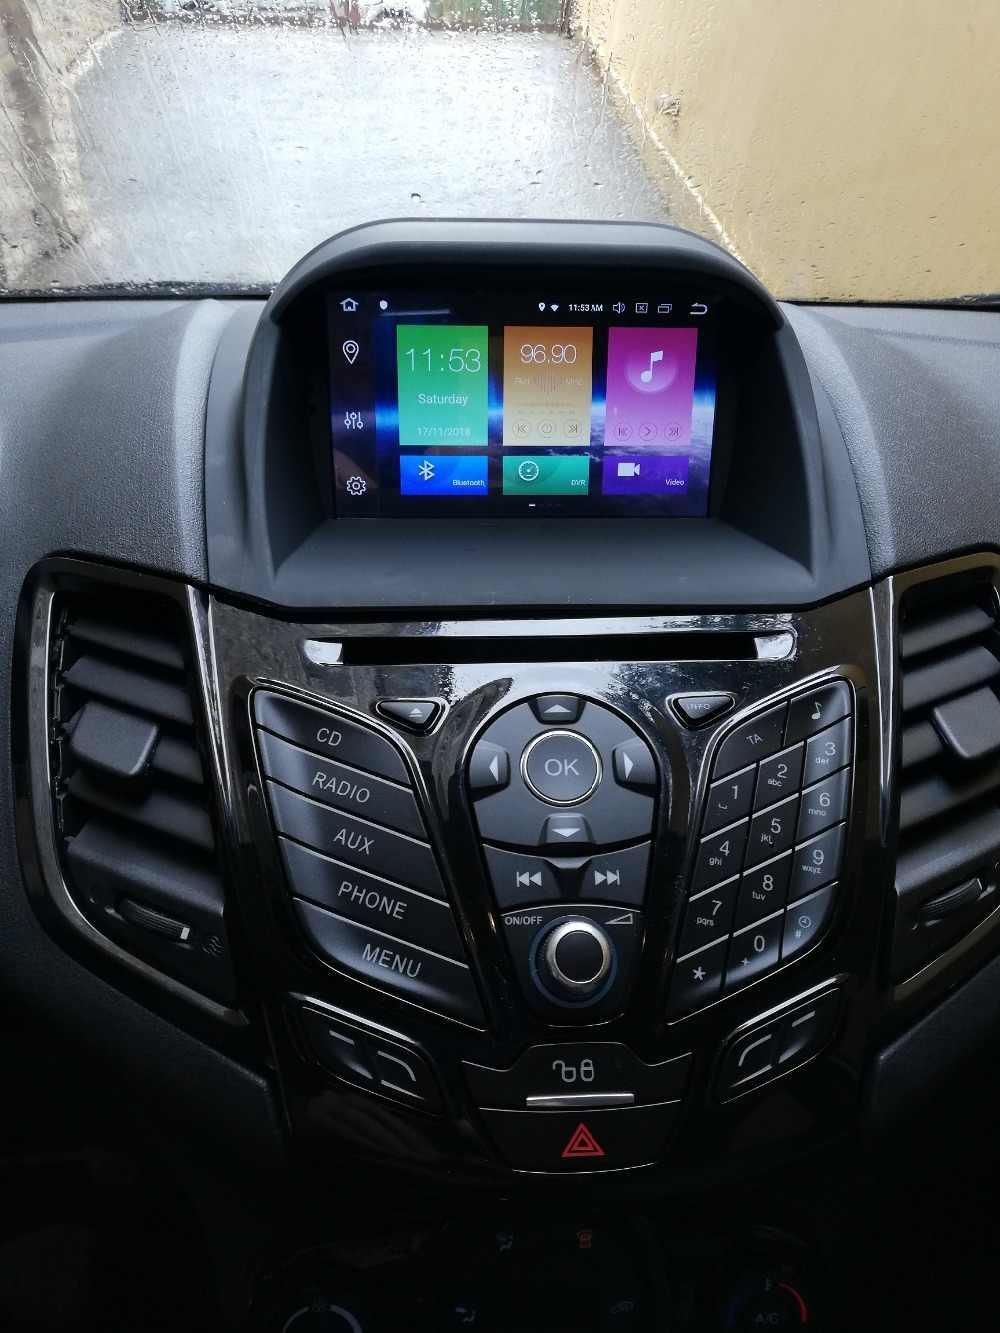 Zwnav Android 9 0 Car Dvd Stereo For Ford Fiesta 2013 2014 2015 2016 Auto Radio Gps Navigation Audio Video Multimedia Headunit Aliexpress